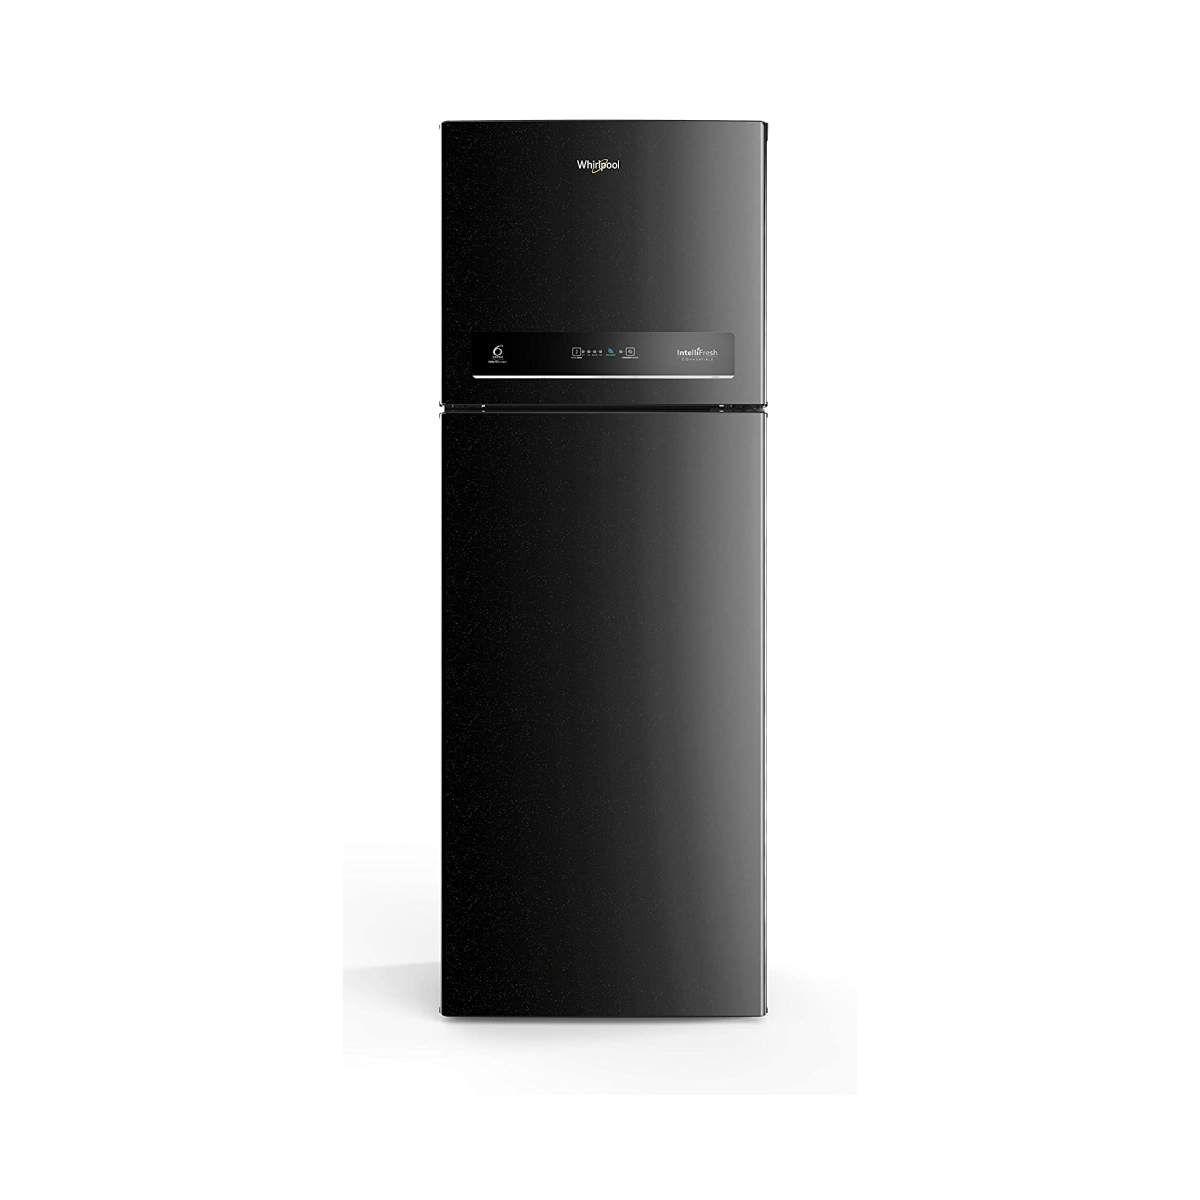 Whirlpool 265 L 3 Star Double Door Refrigerator (INTELLIFRESH INV CNV 278 3S)